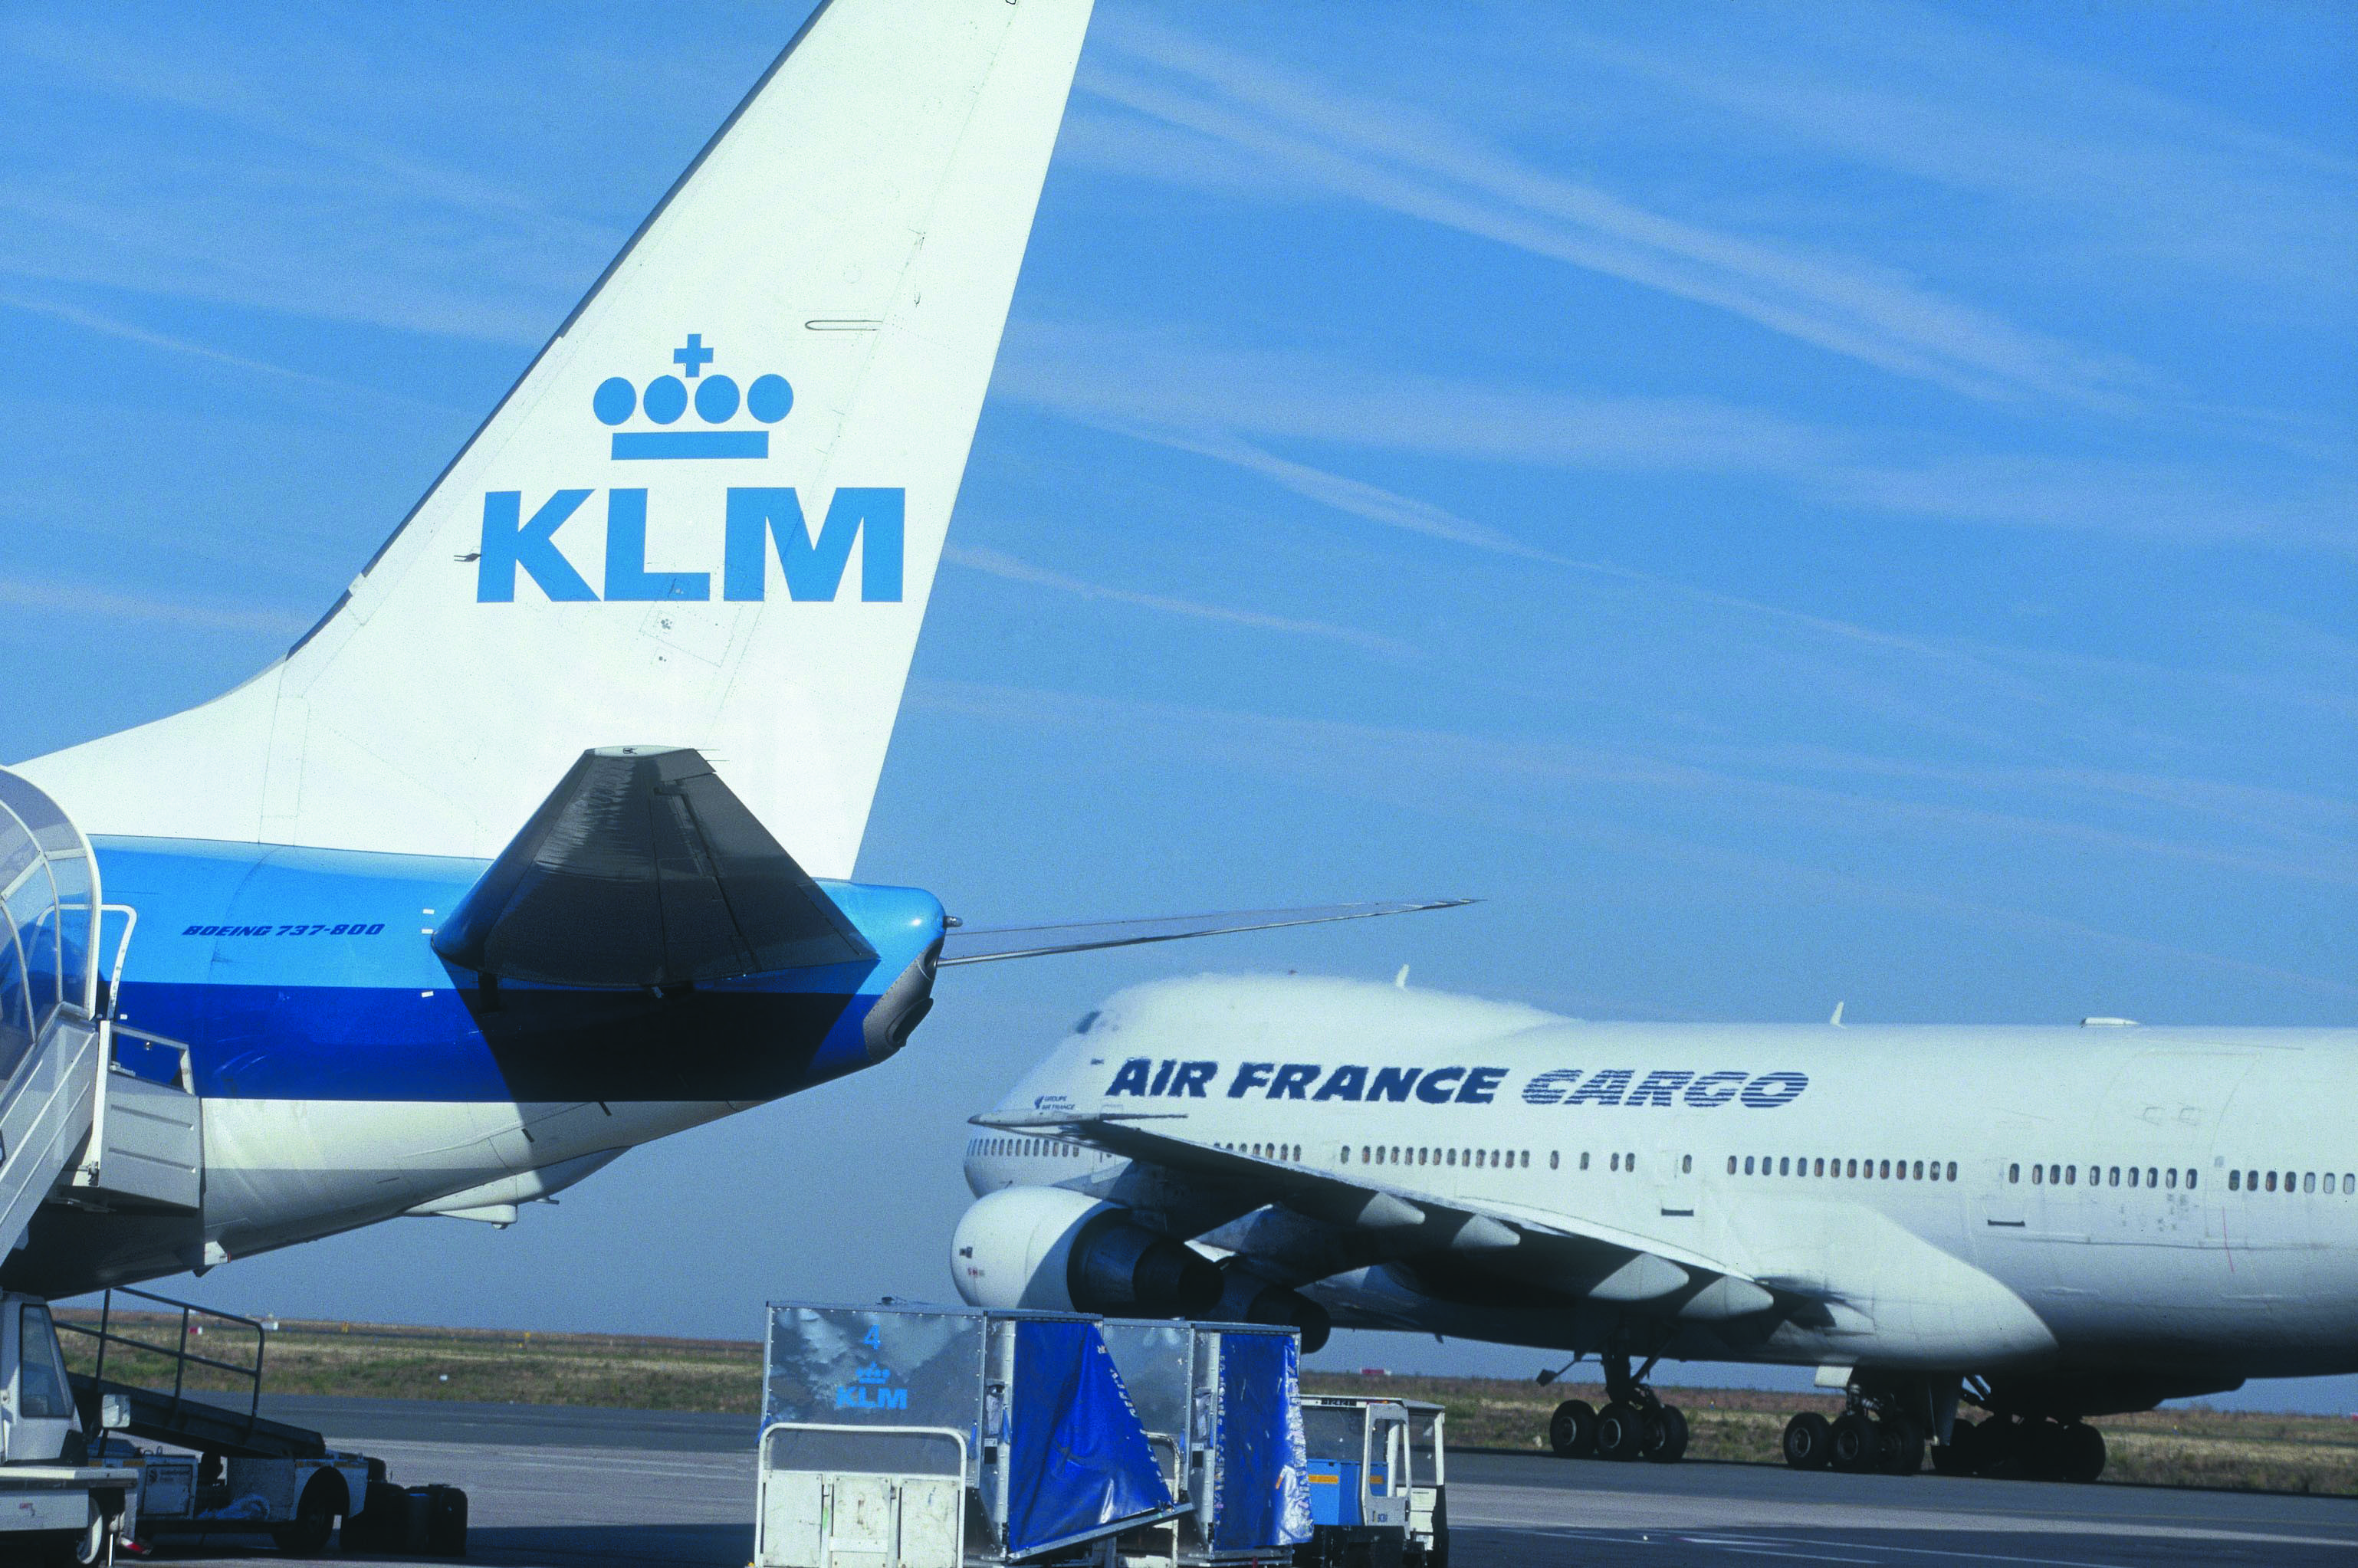 AFKLM cargo return to breakeven by 2017 Aviacion